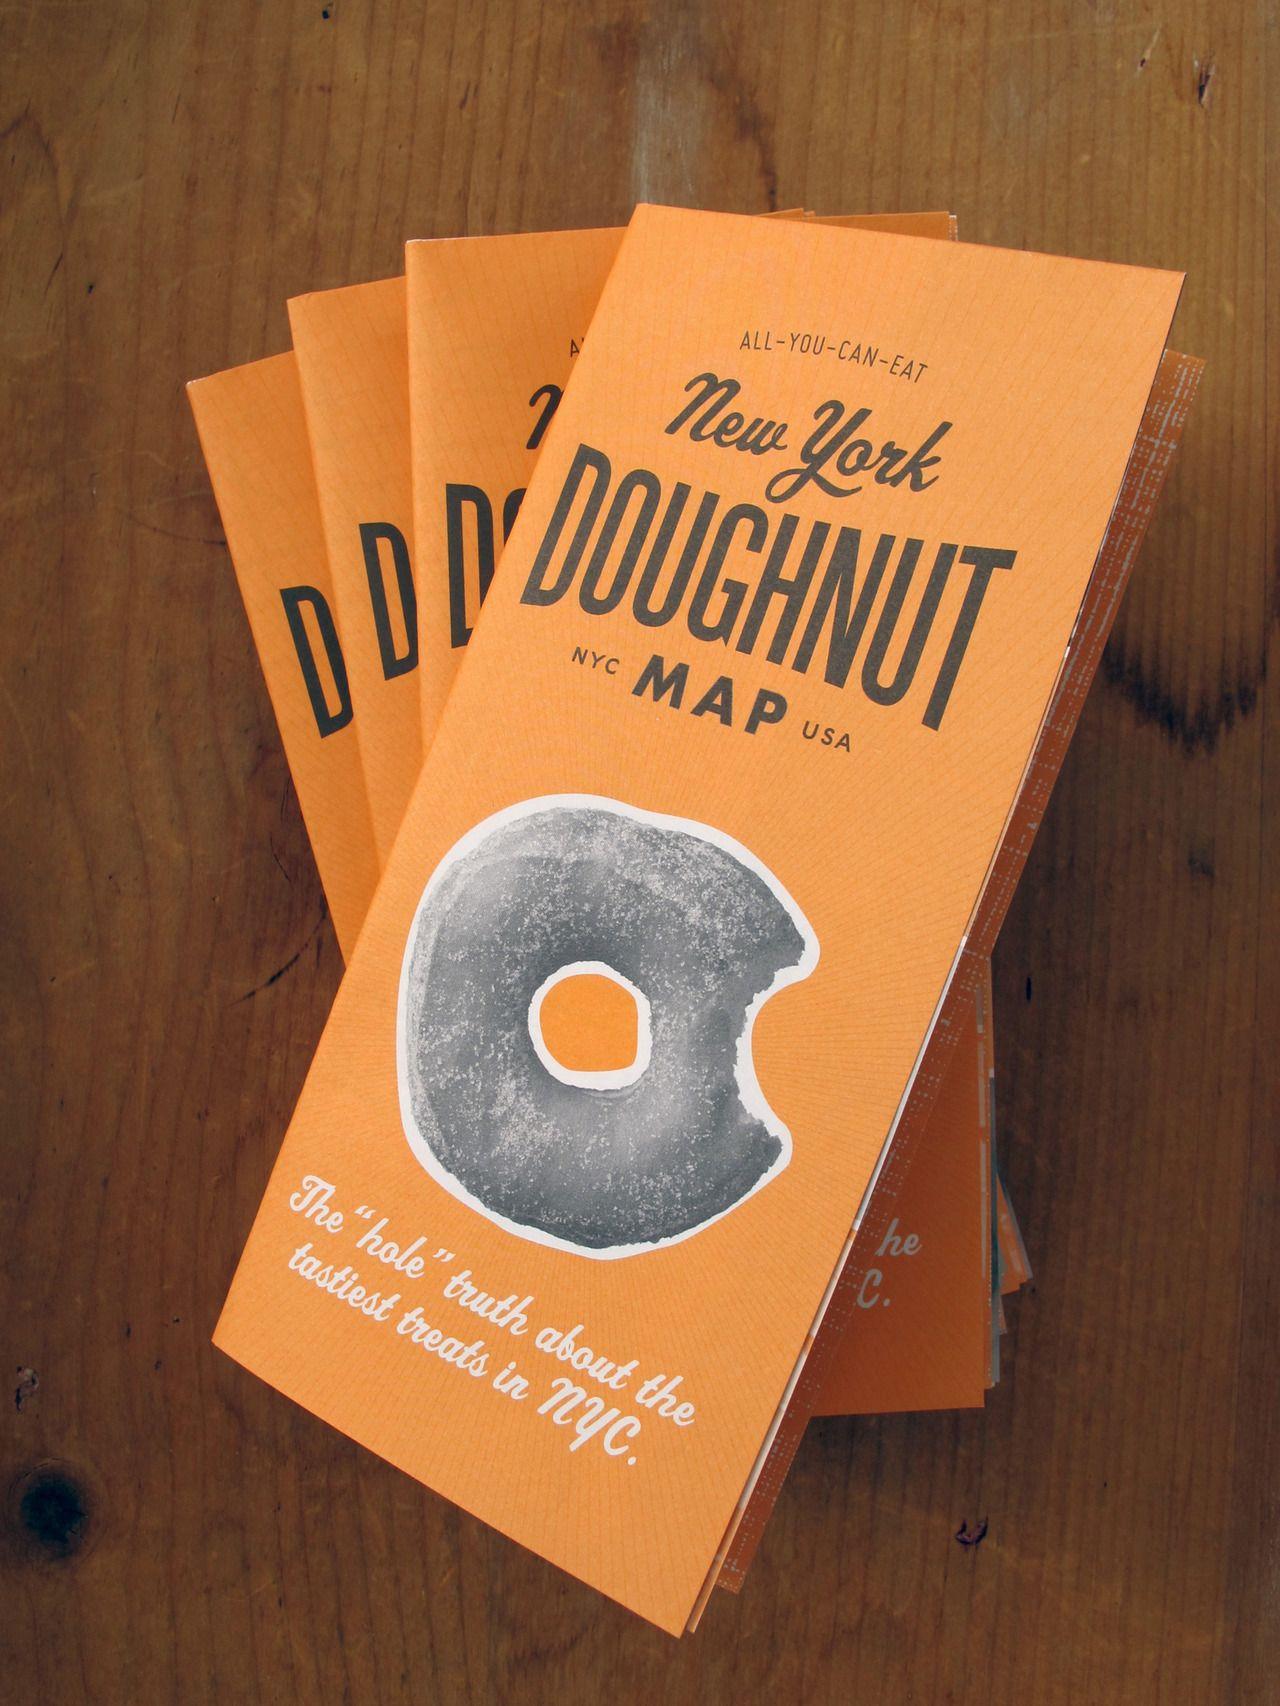 The New York doughnut map including 35